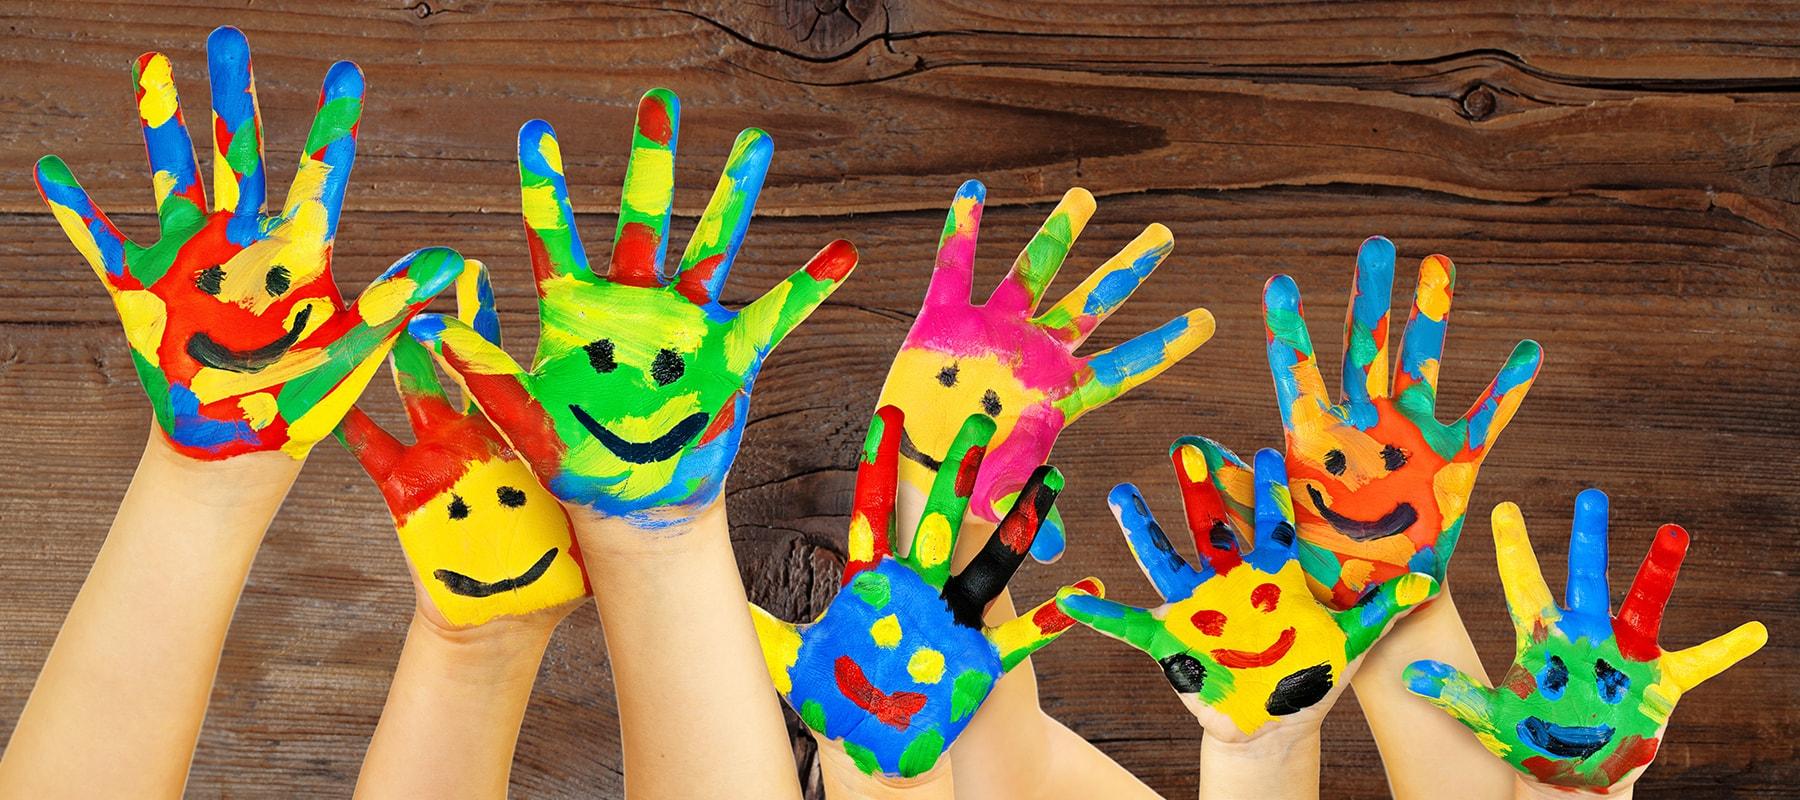 kinderhände, sozialpädagogische Familien Thalmann, Malfarbe